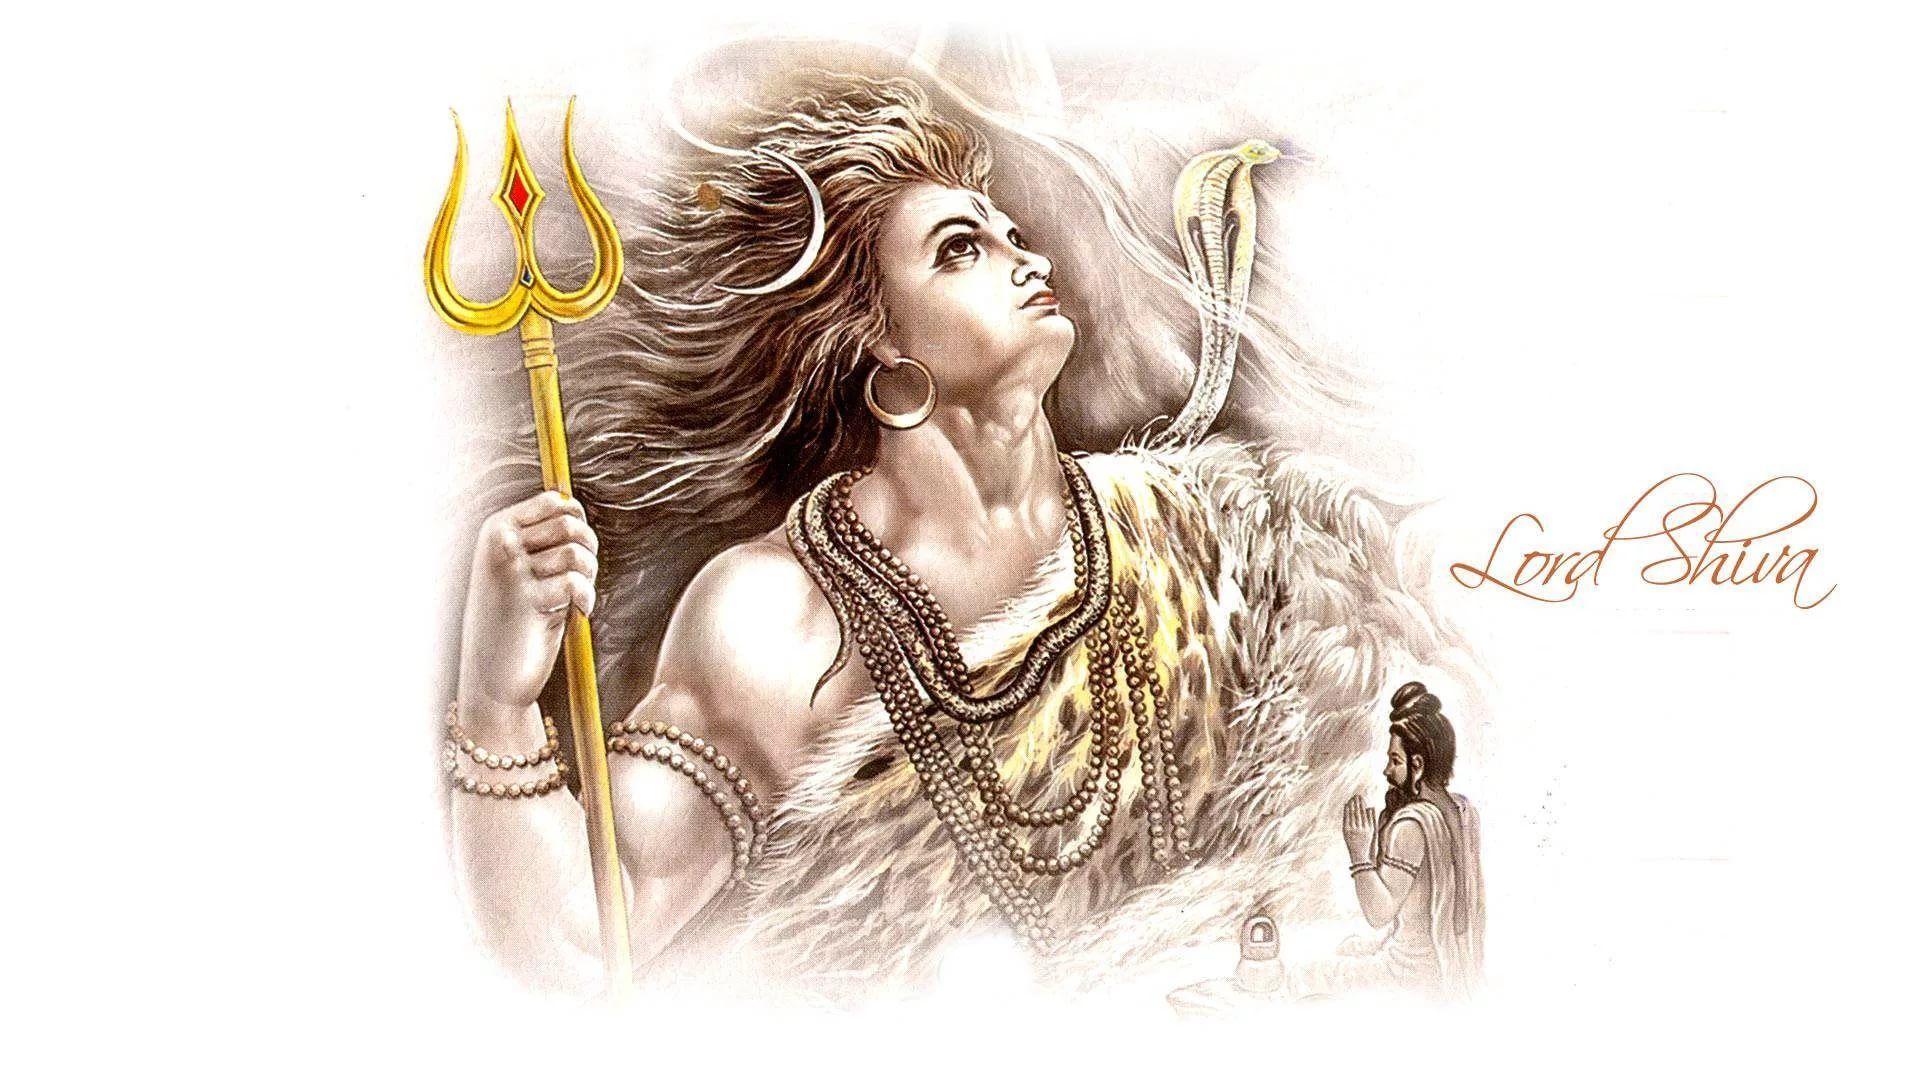 Lord Shiva Tandav Hd desktop wallpaper